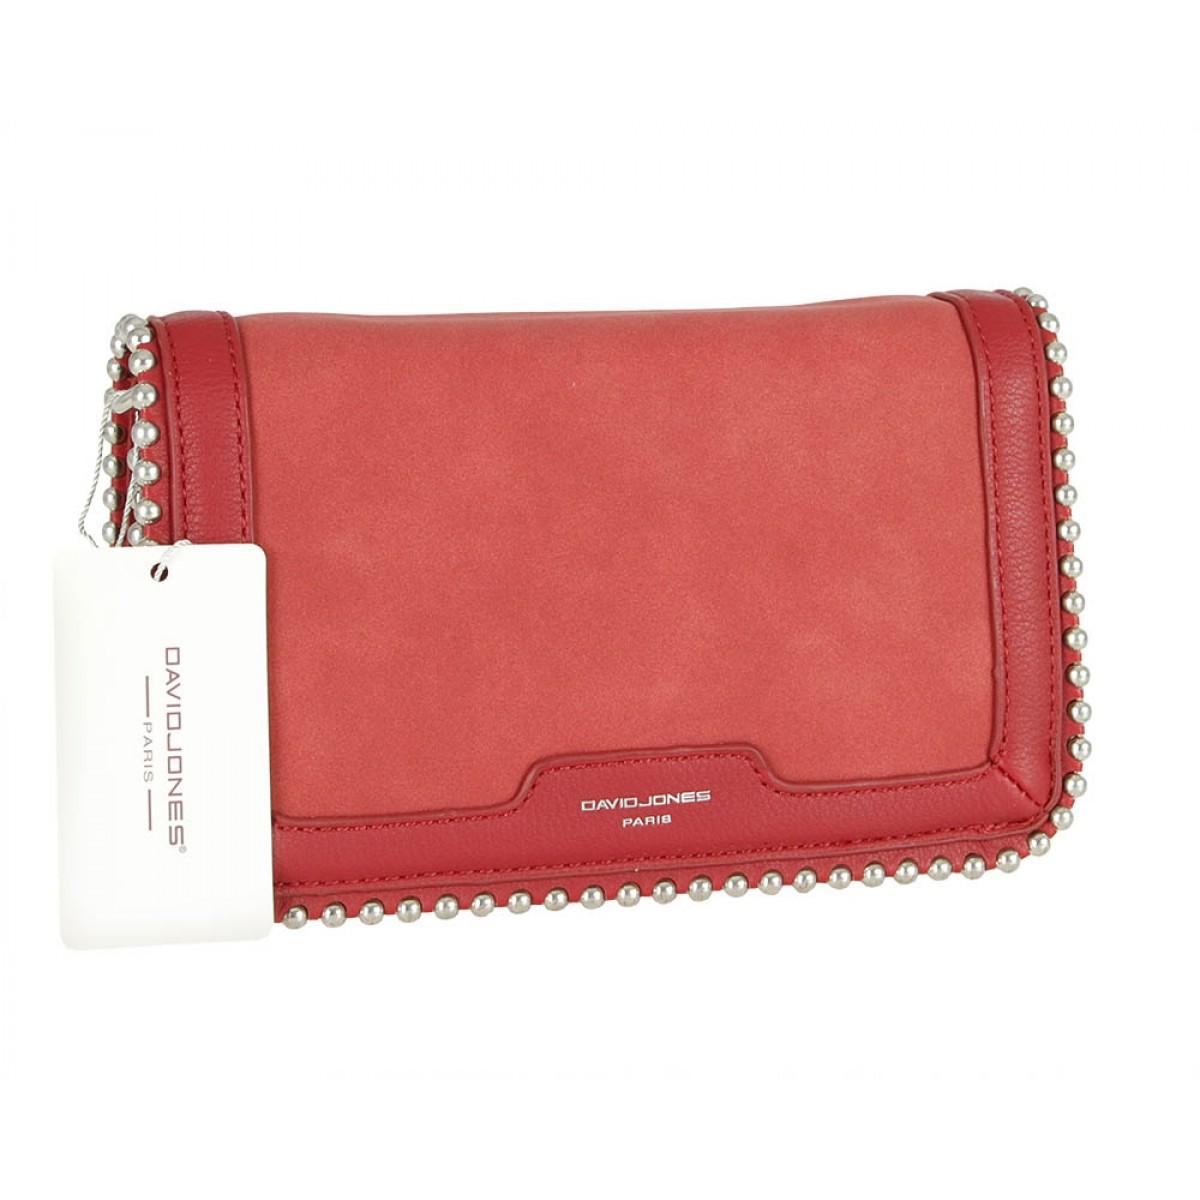 Жіноча сумка David Jones 6165-2 DARK RED